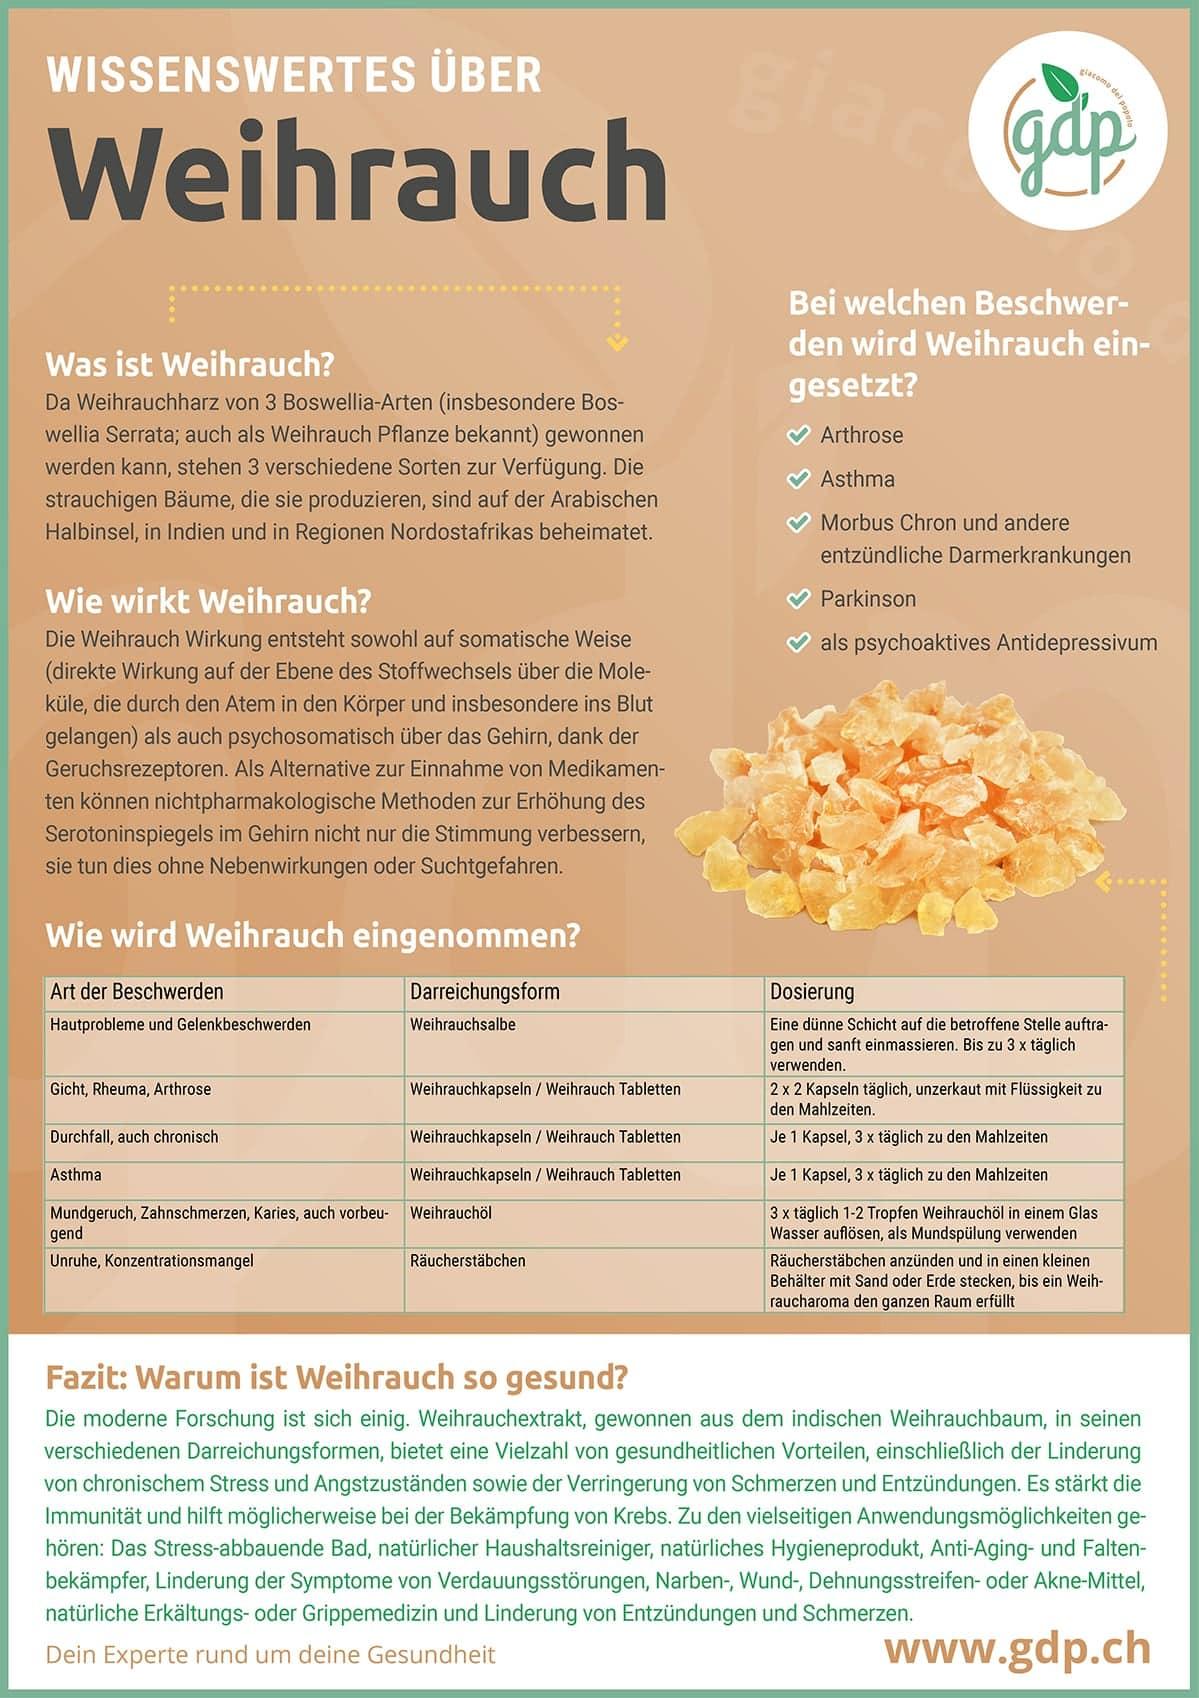 Weihrauch gdp infografik